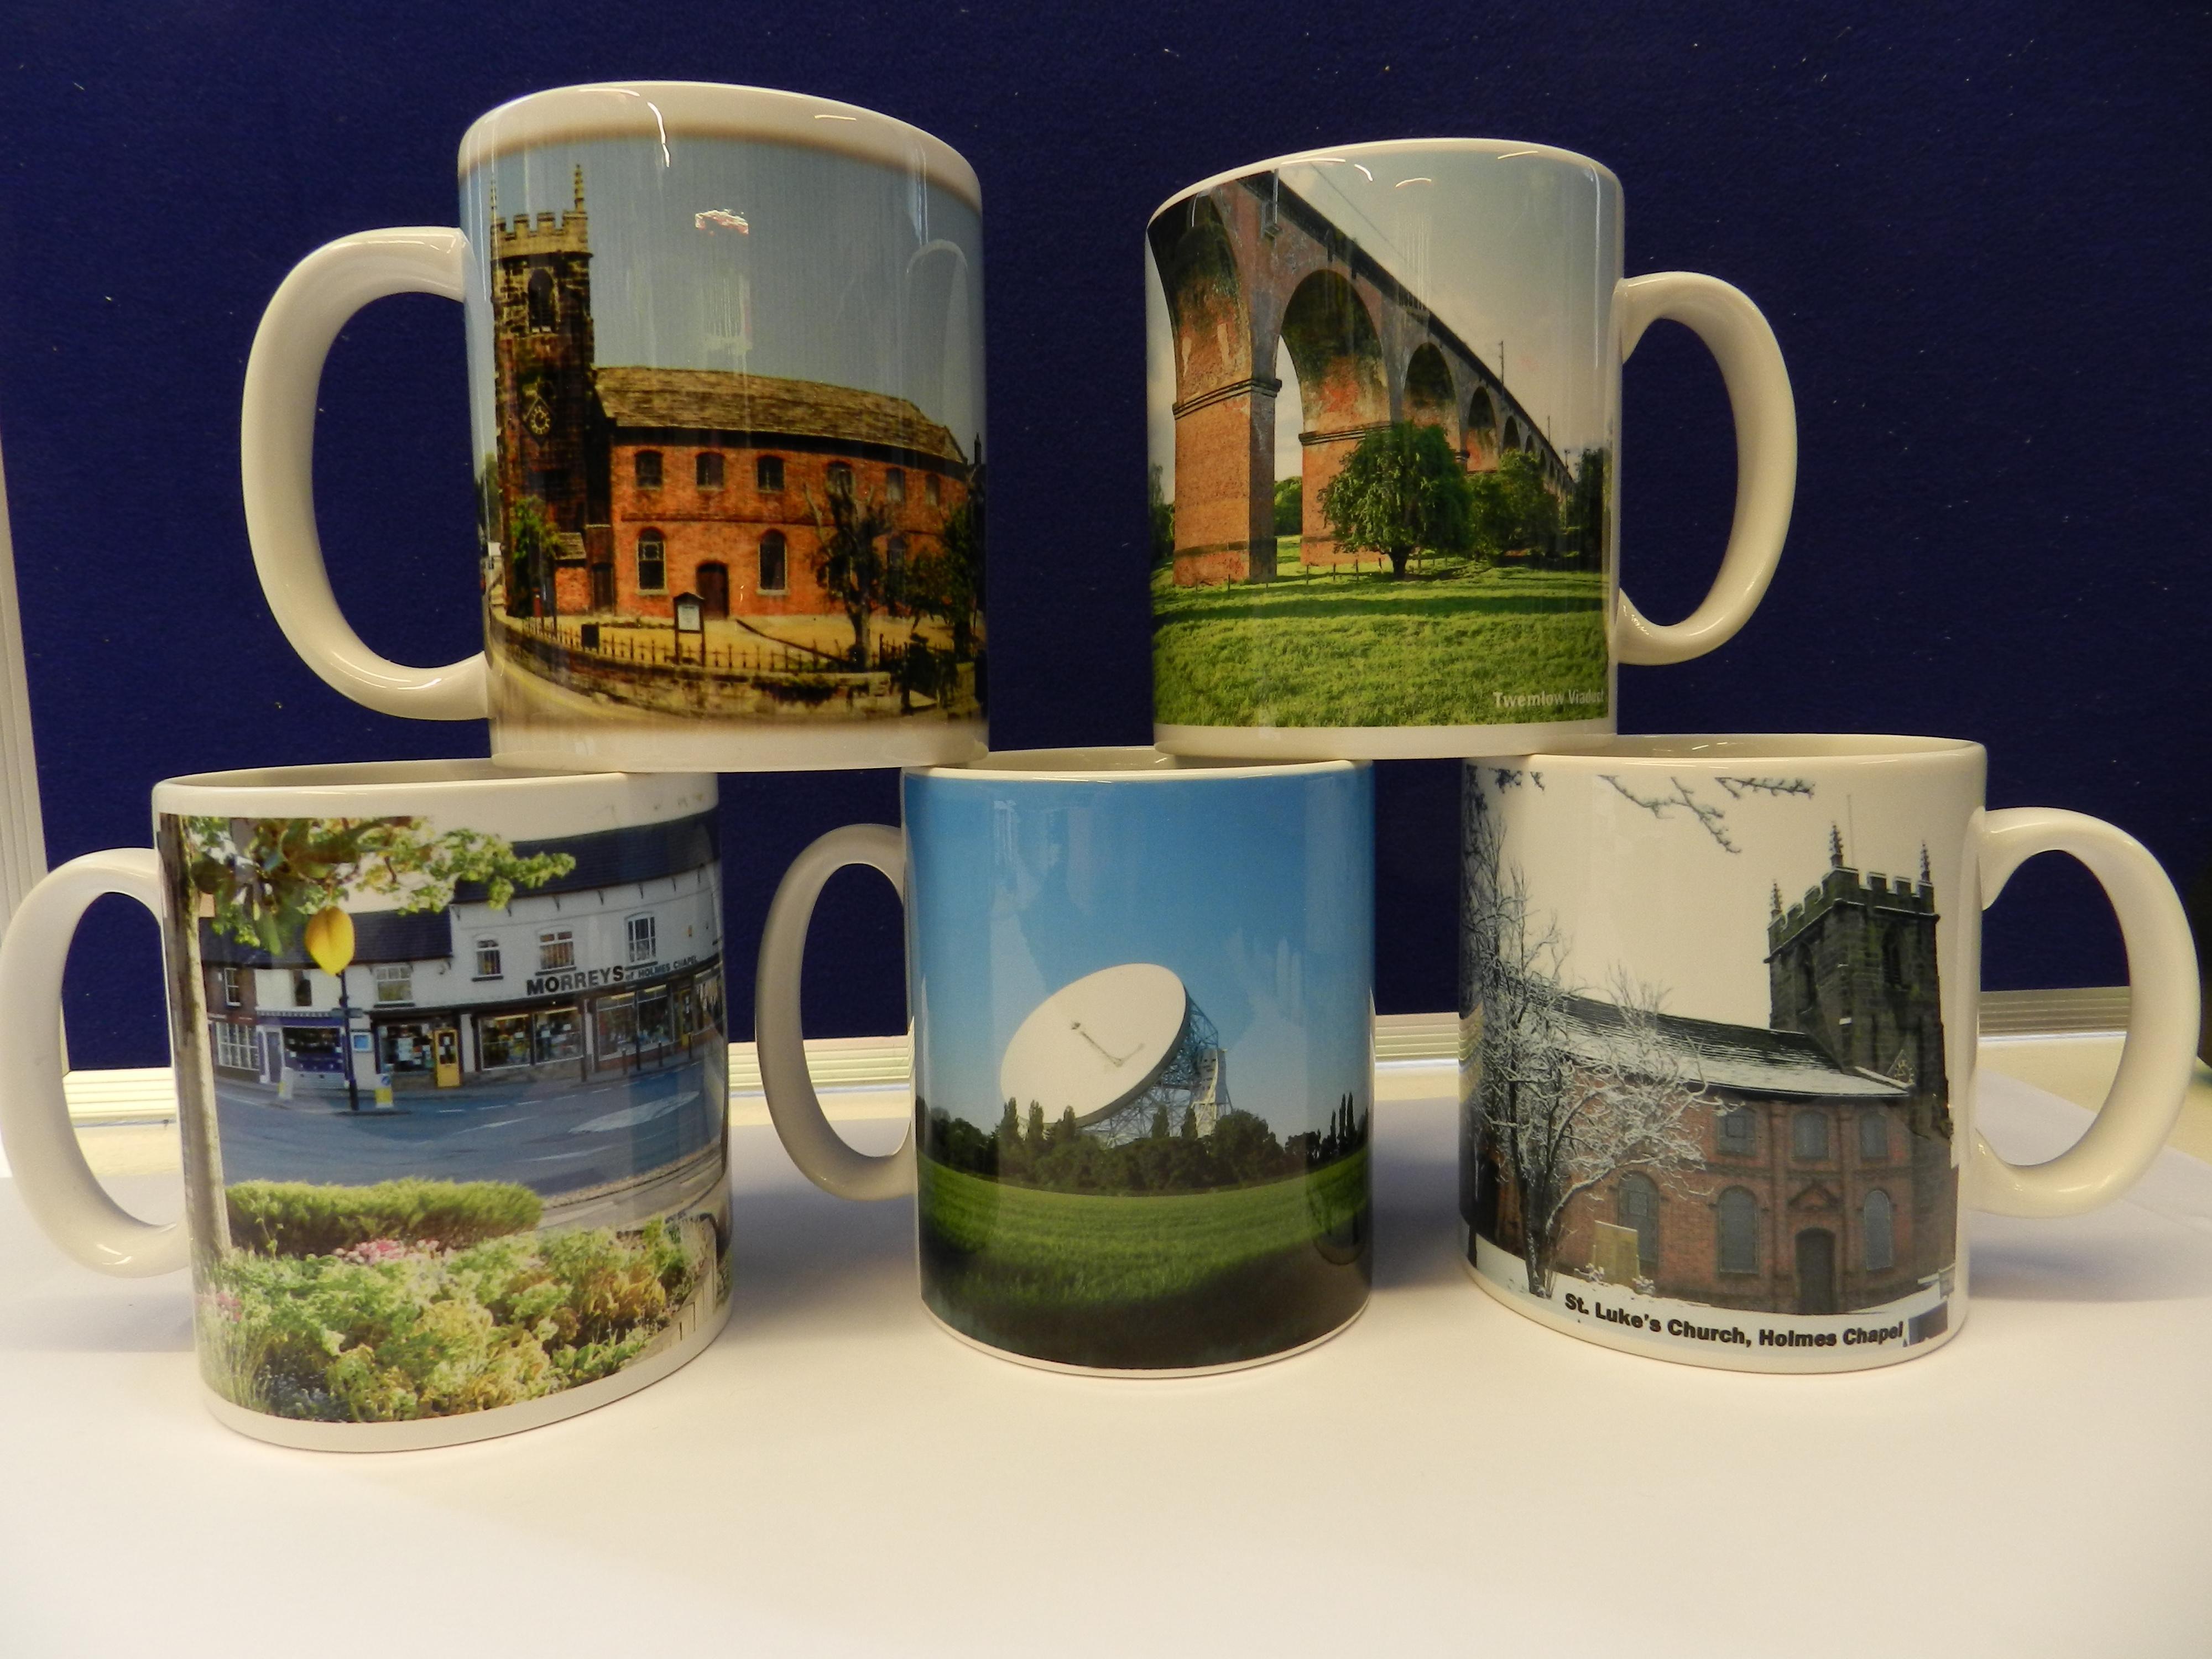 Holmes Chapel Branded Mugs